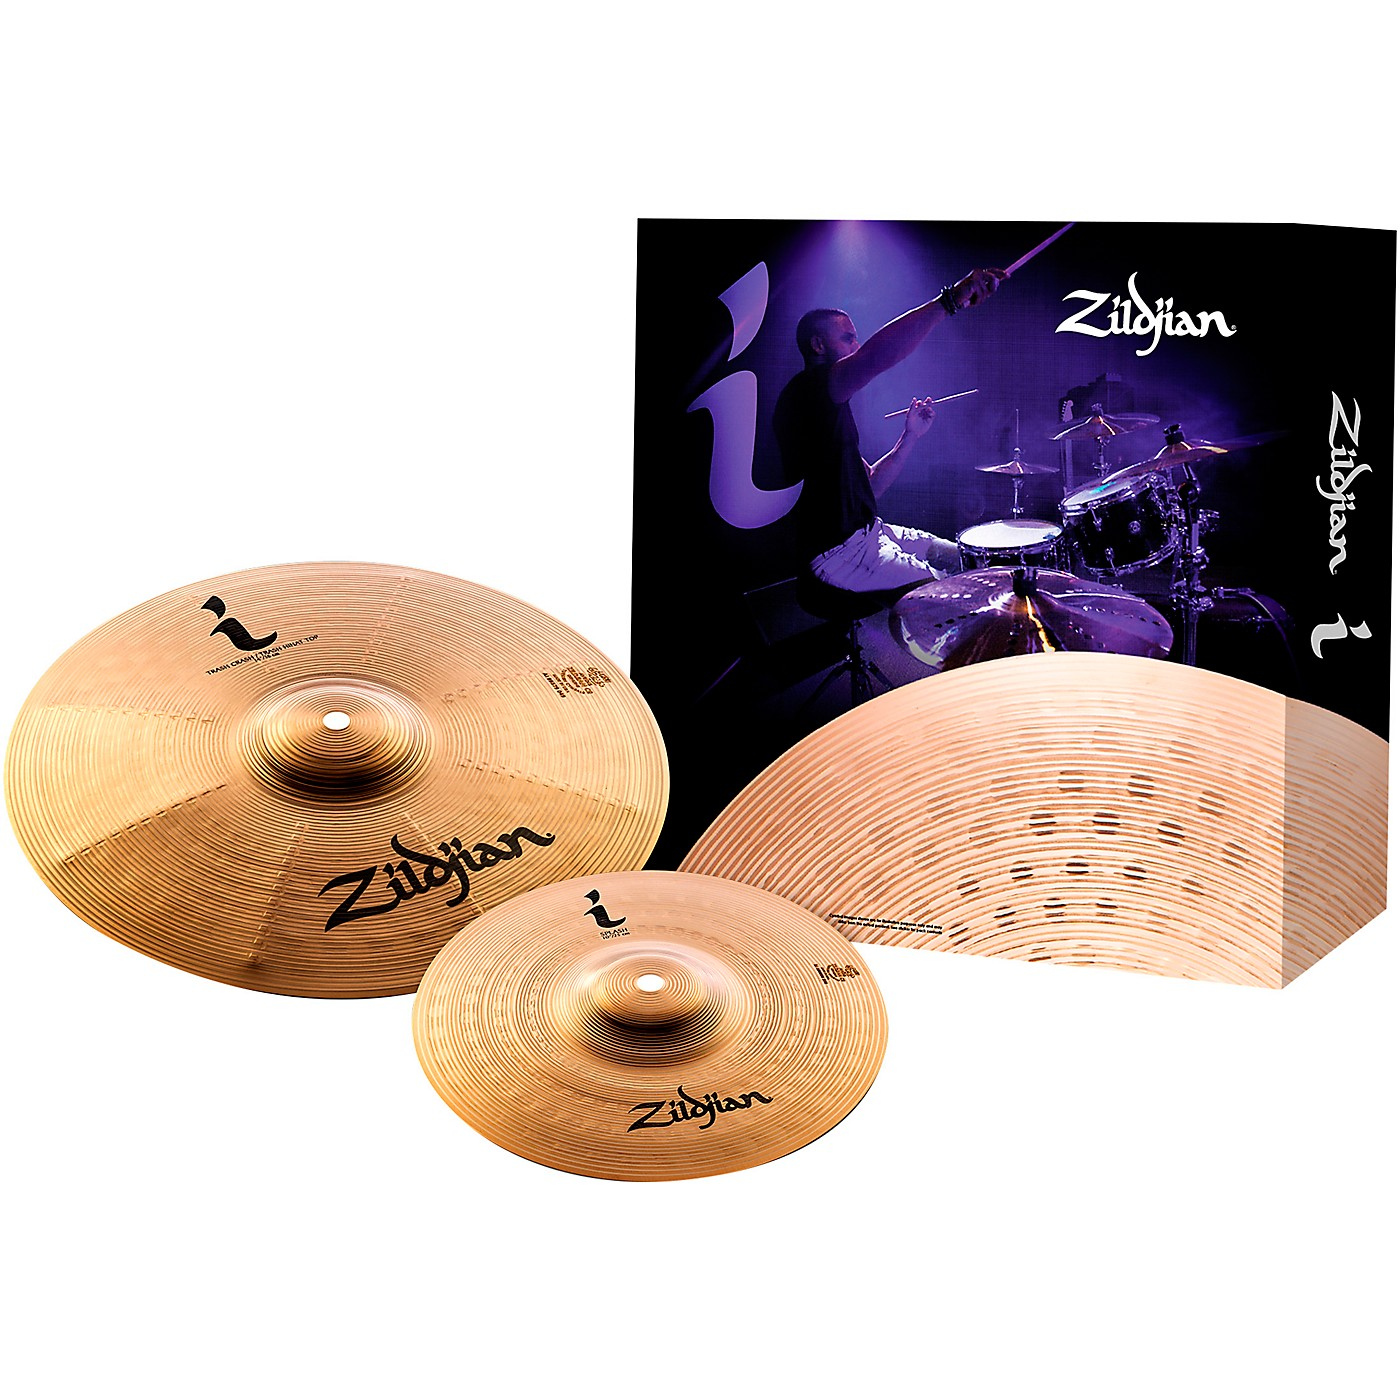 Zildjian I Series Expression Cymbal Pack 1A thumbnail